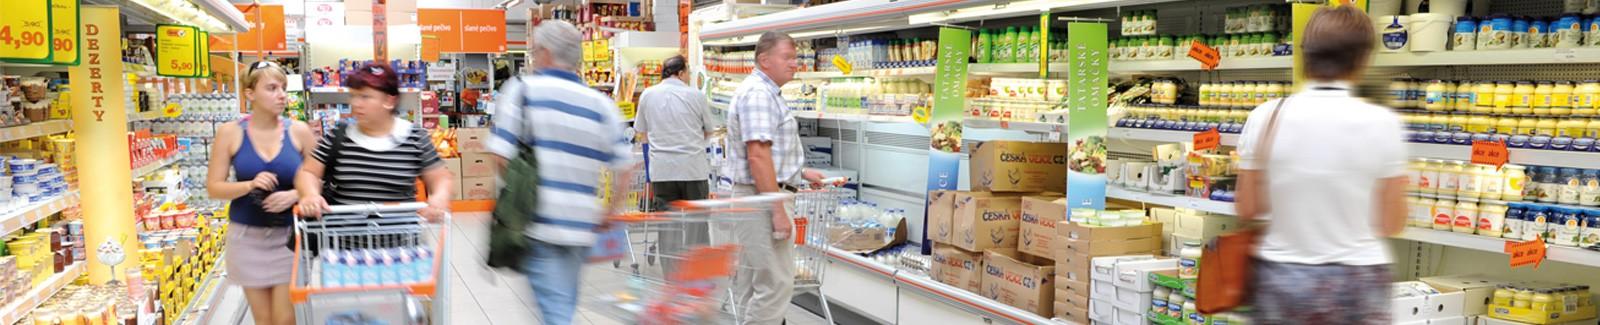 COOP prodejny potravin